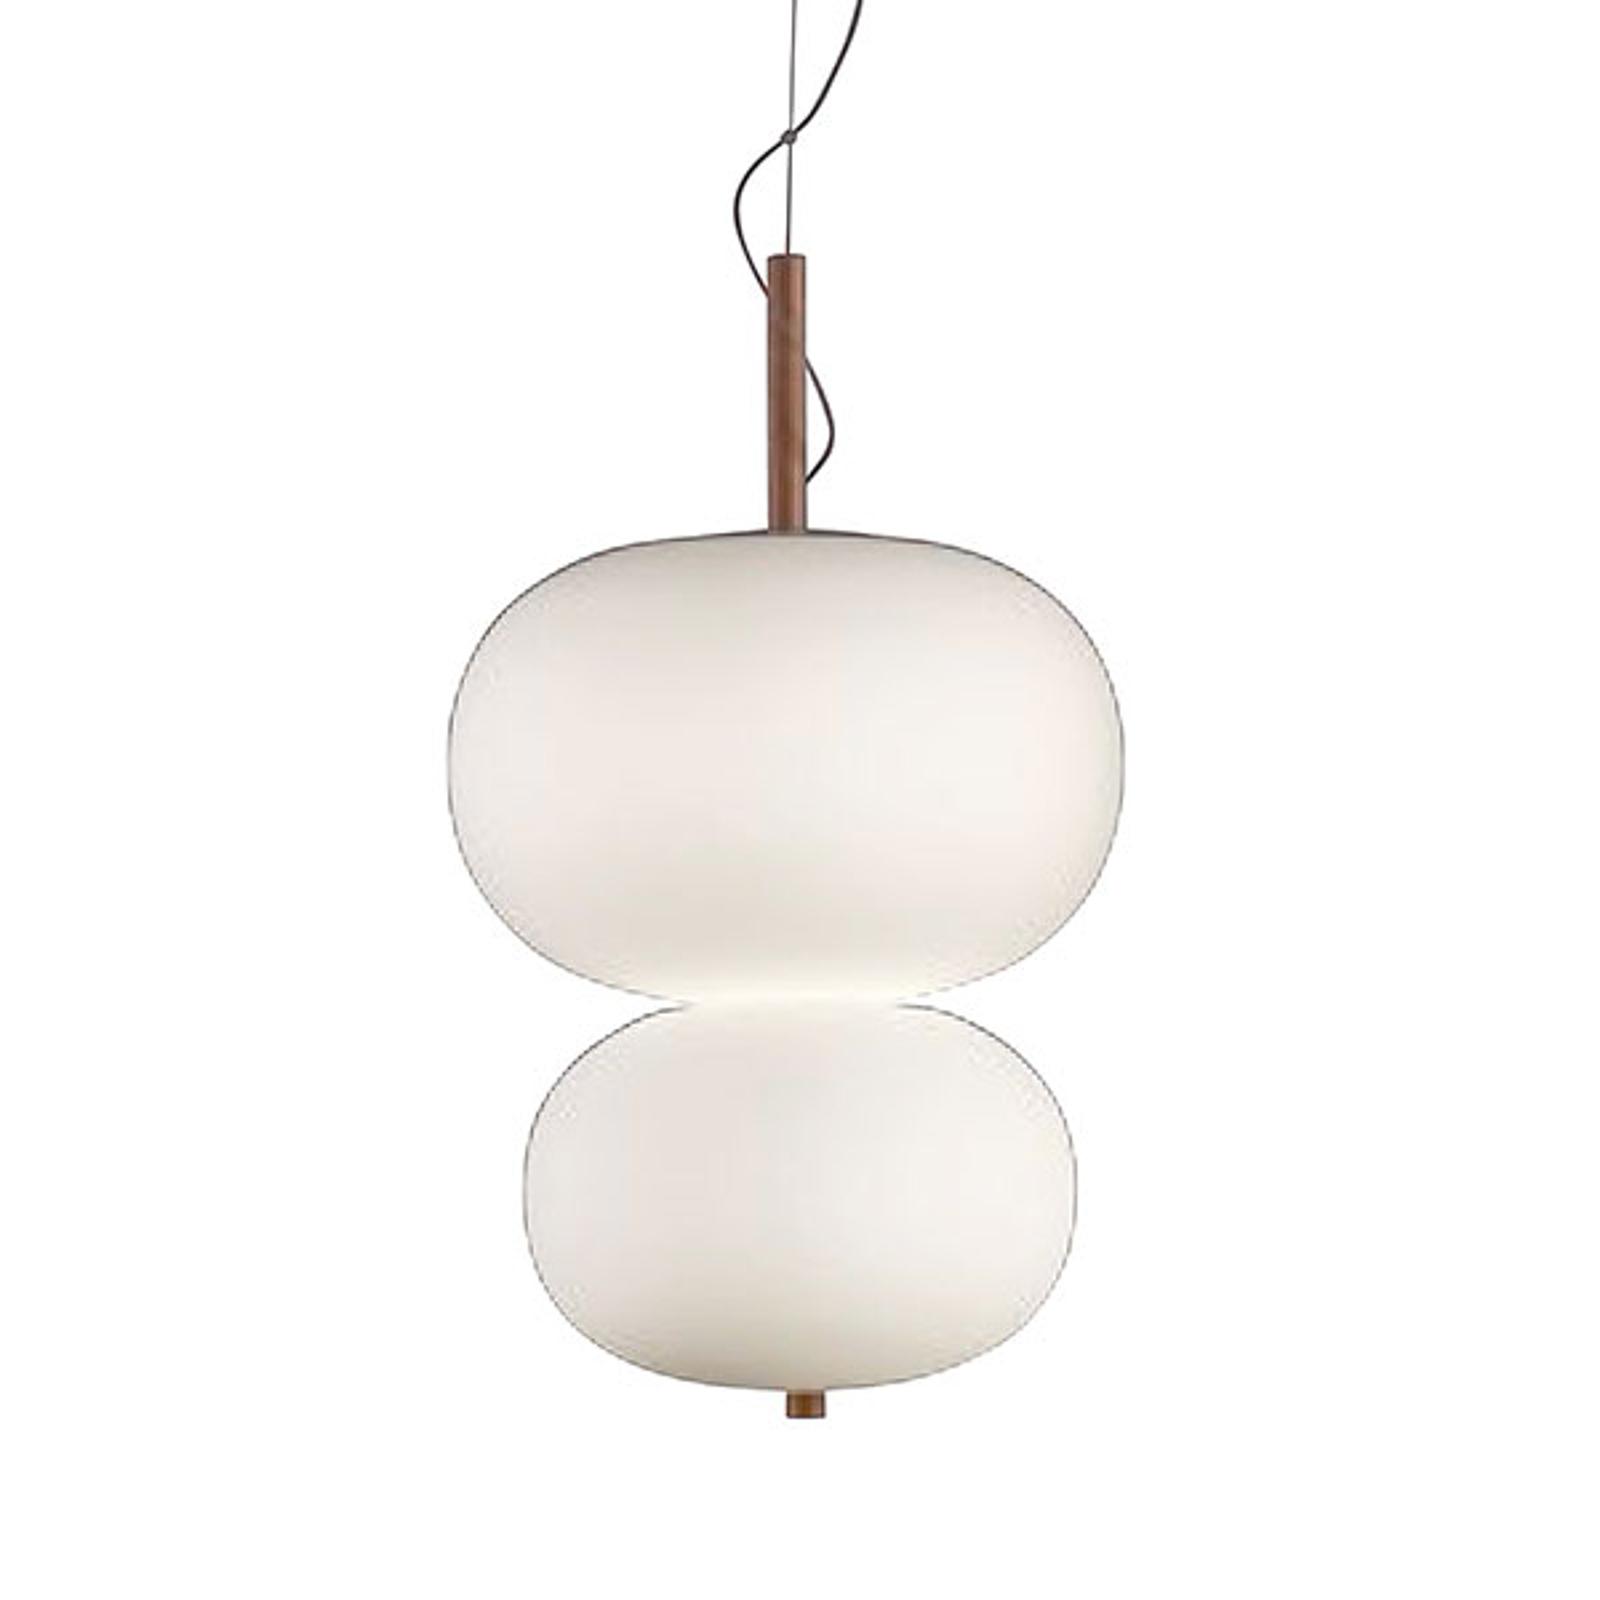 Grok iLargi hanglamp, hoogte 67 cm, licht essen